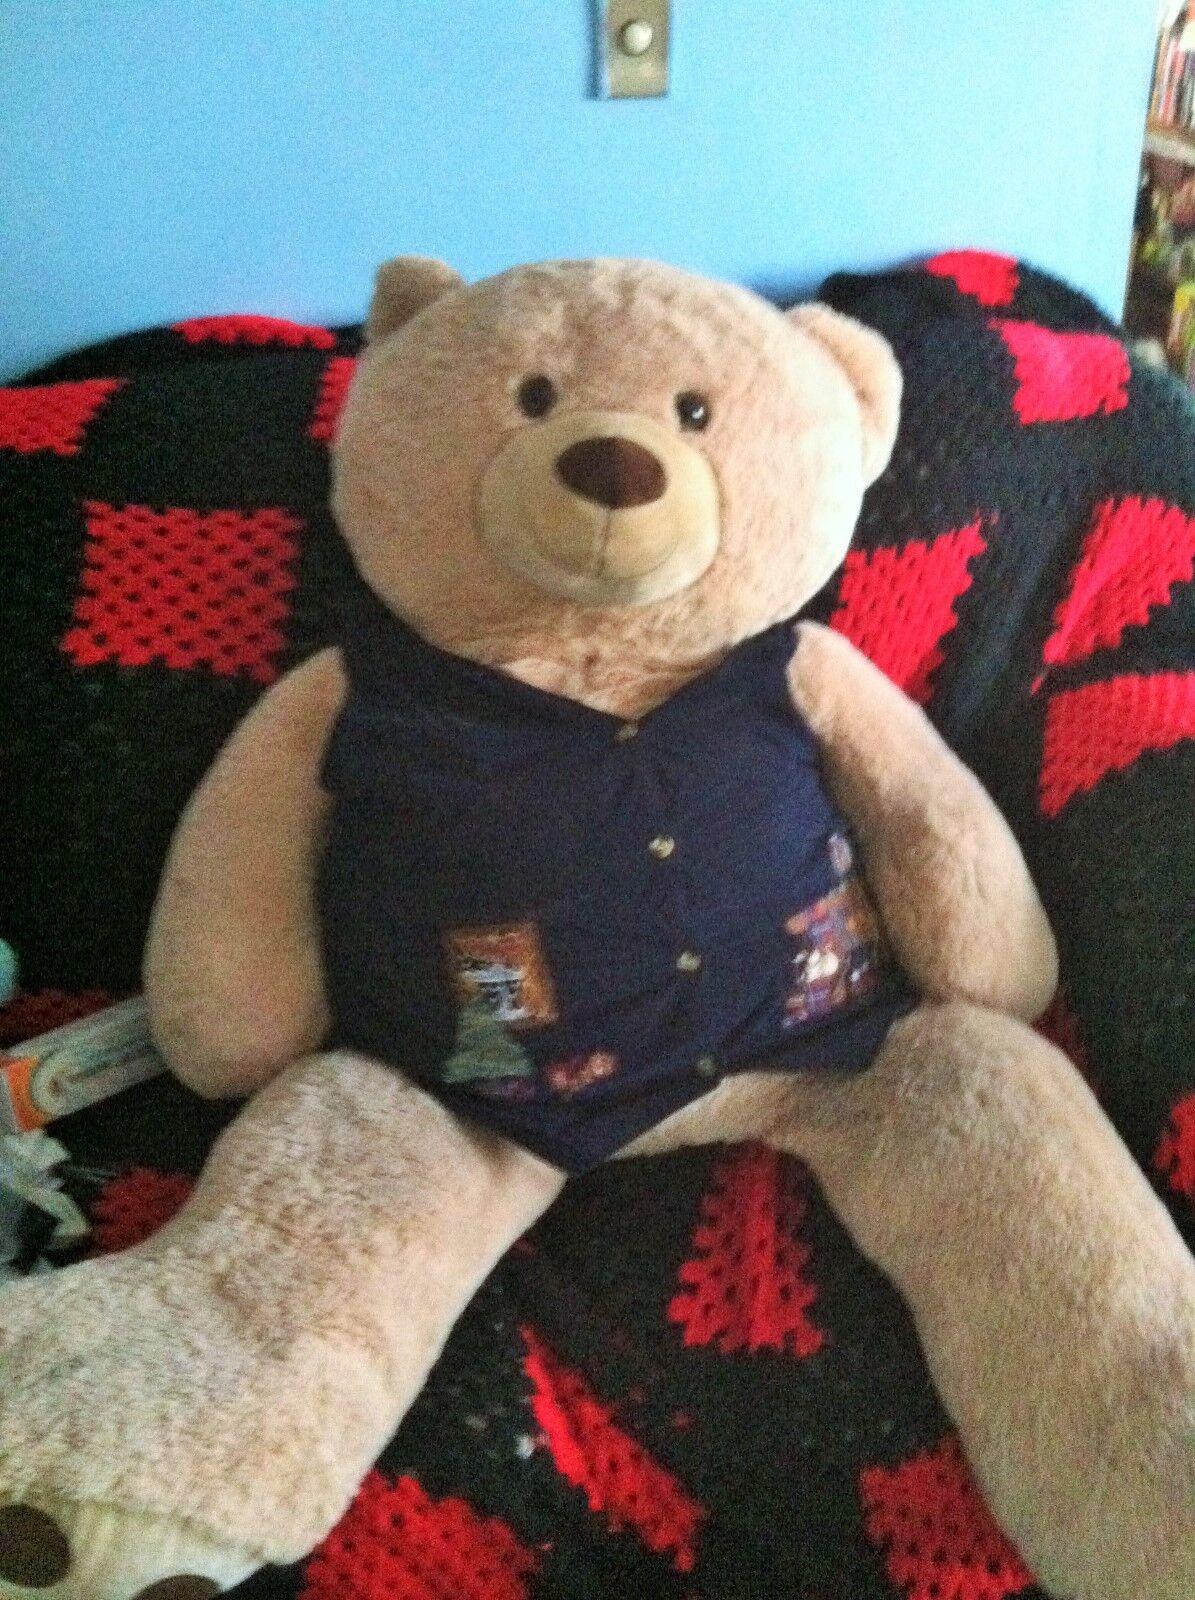 GIANT TEDDY BEAR REAL RARE JUMBO  FRIENDLY  4 FEET Stuffed Animal BEST MADE